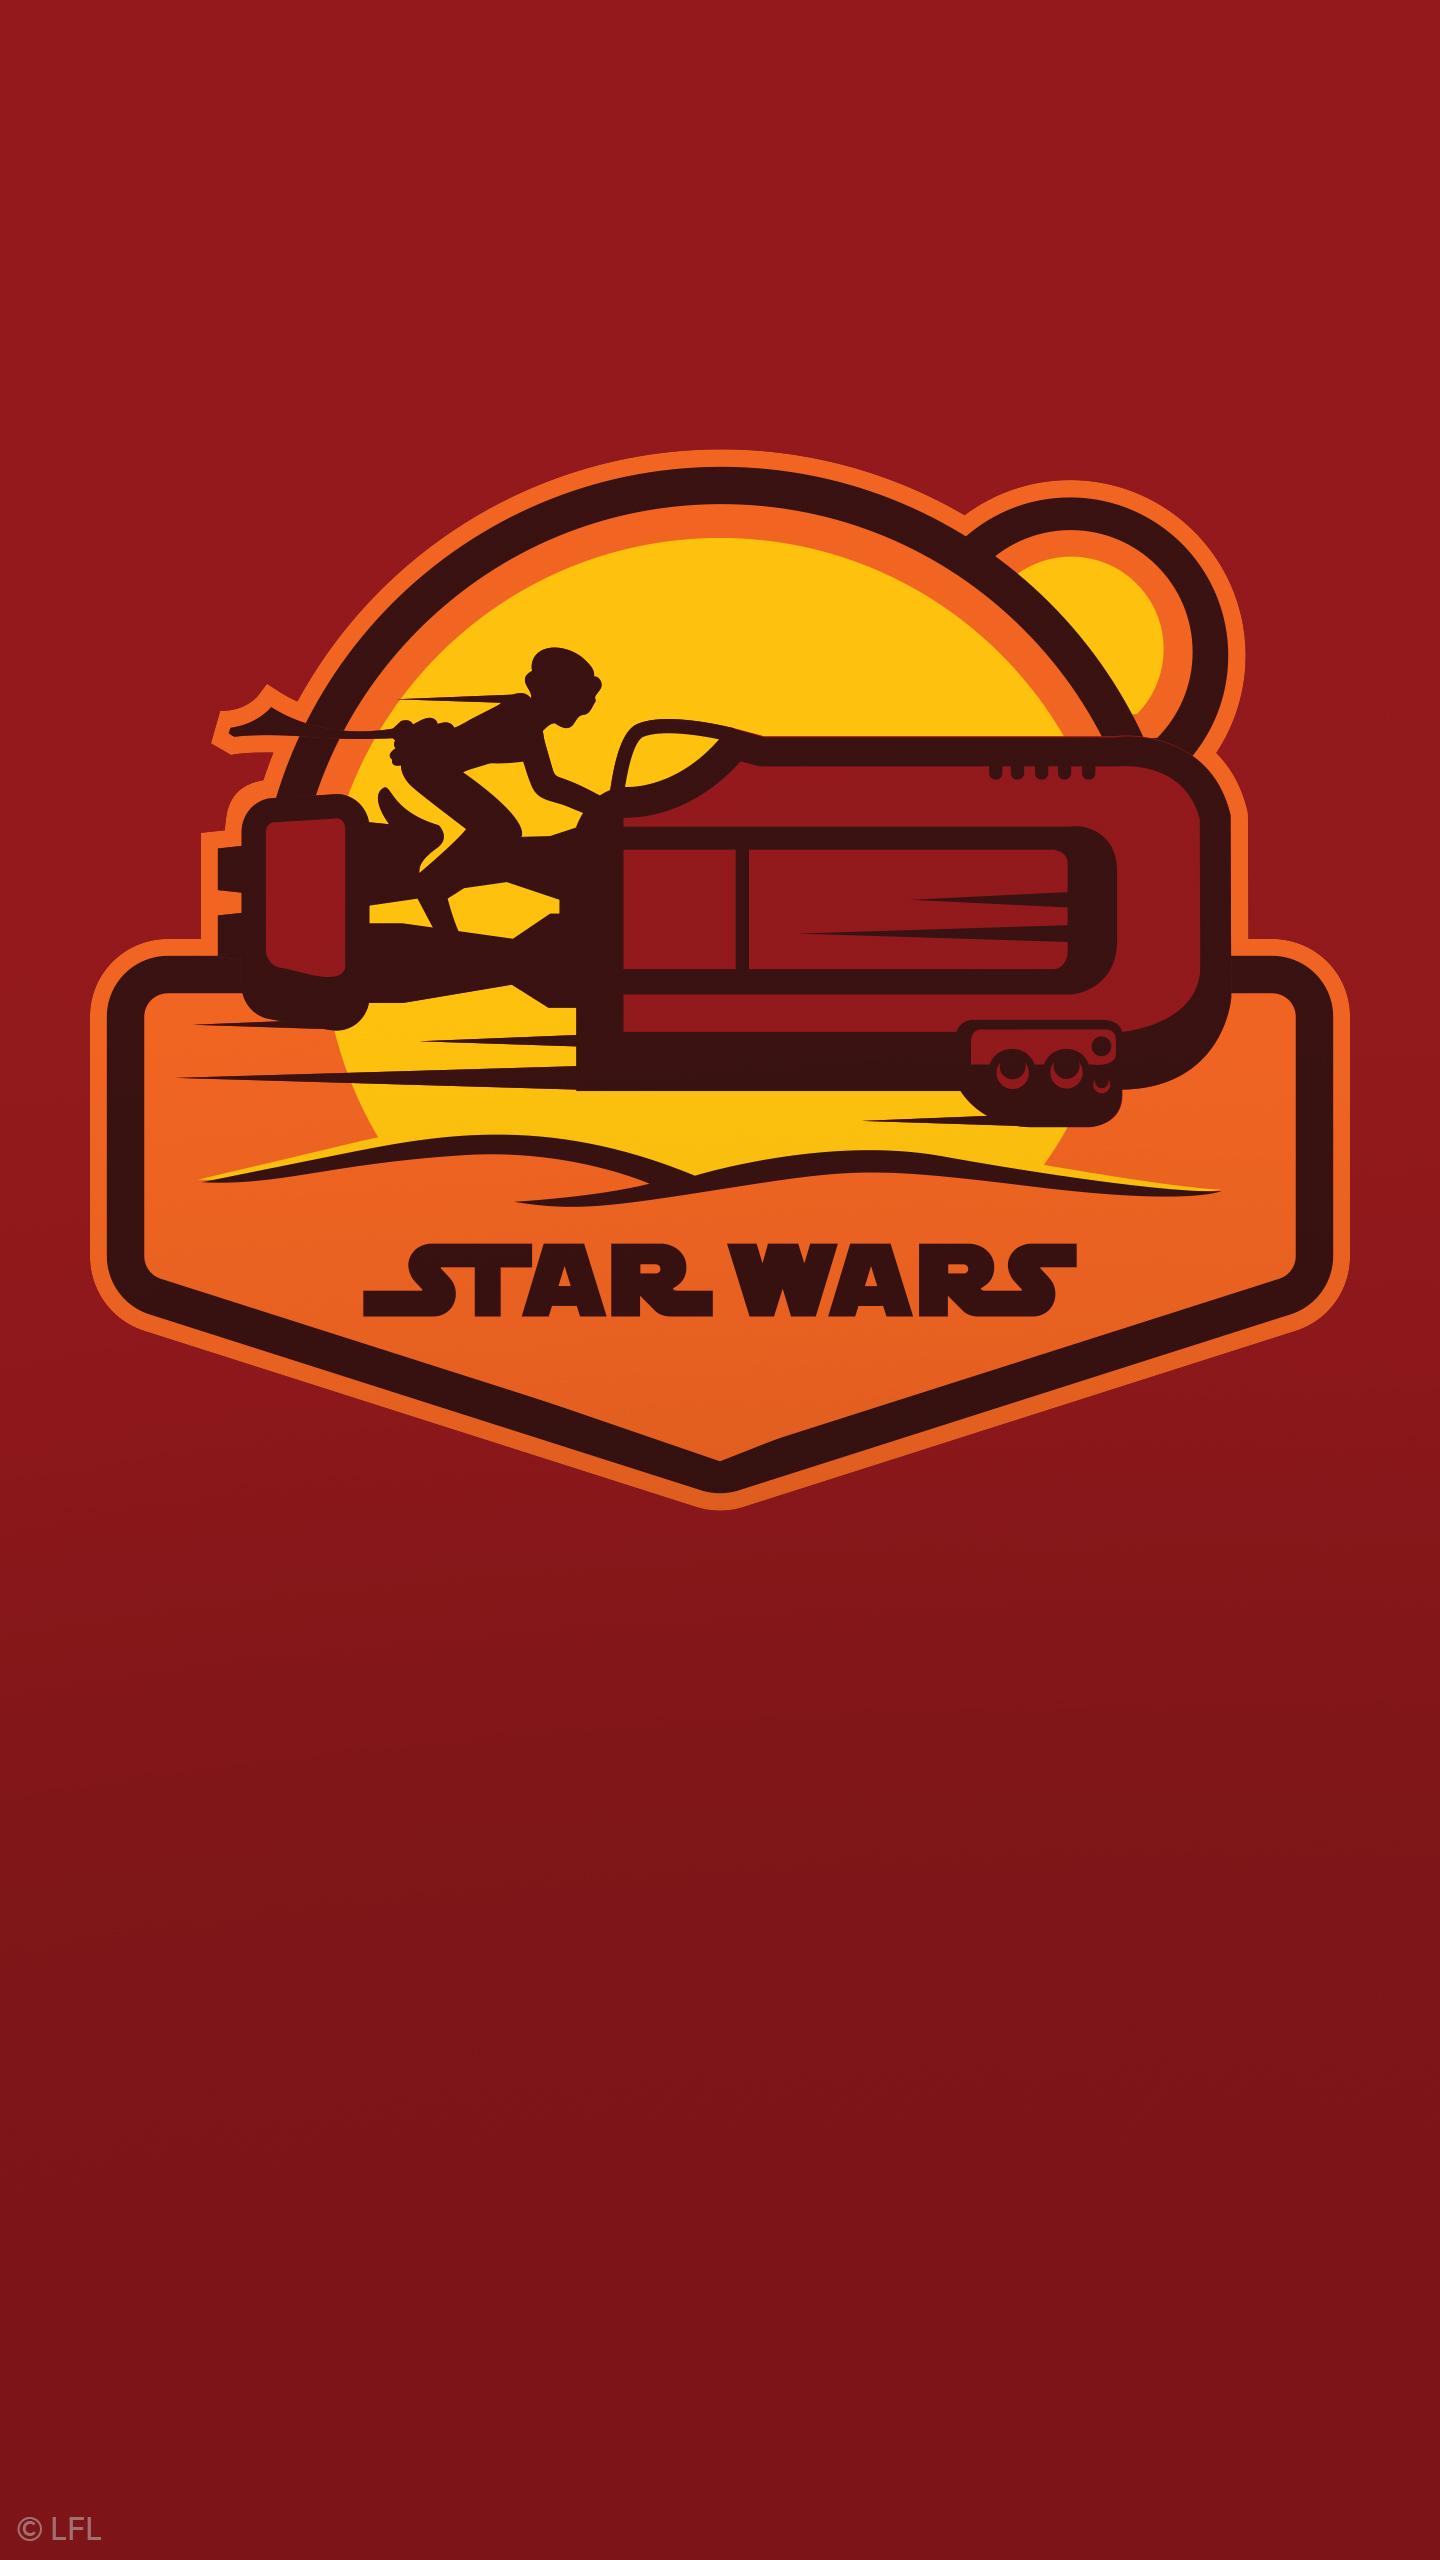 Star Wars Rebel Wallpaper Iphone Star Wars The Force Awakens Wallpaper